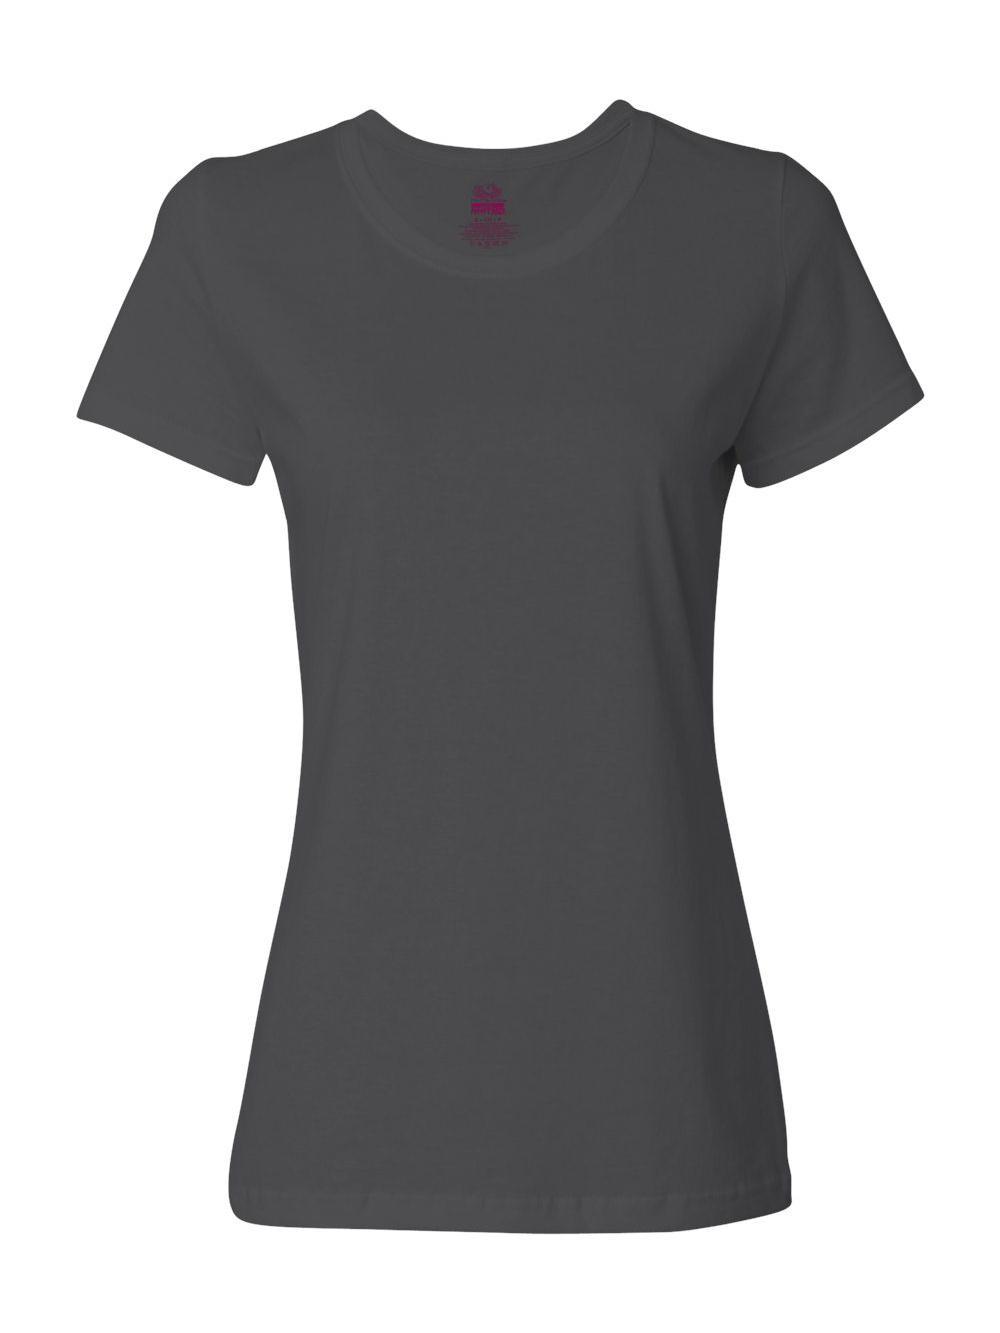 Fruit-of-the-Loom-HD-Cotton-Women-039-s-Short-Sleeve-T-Shirt-L3930R thumbnail 9